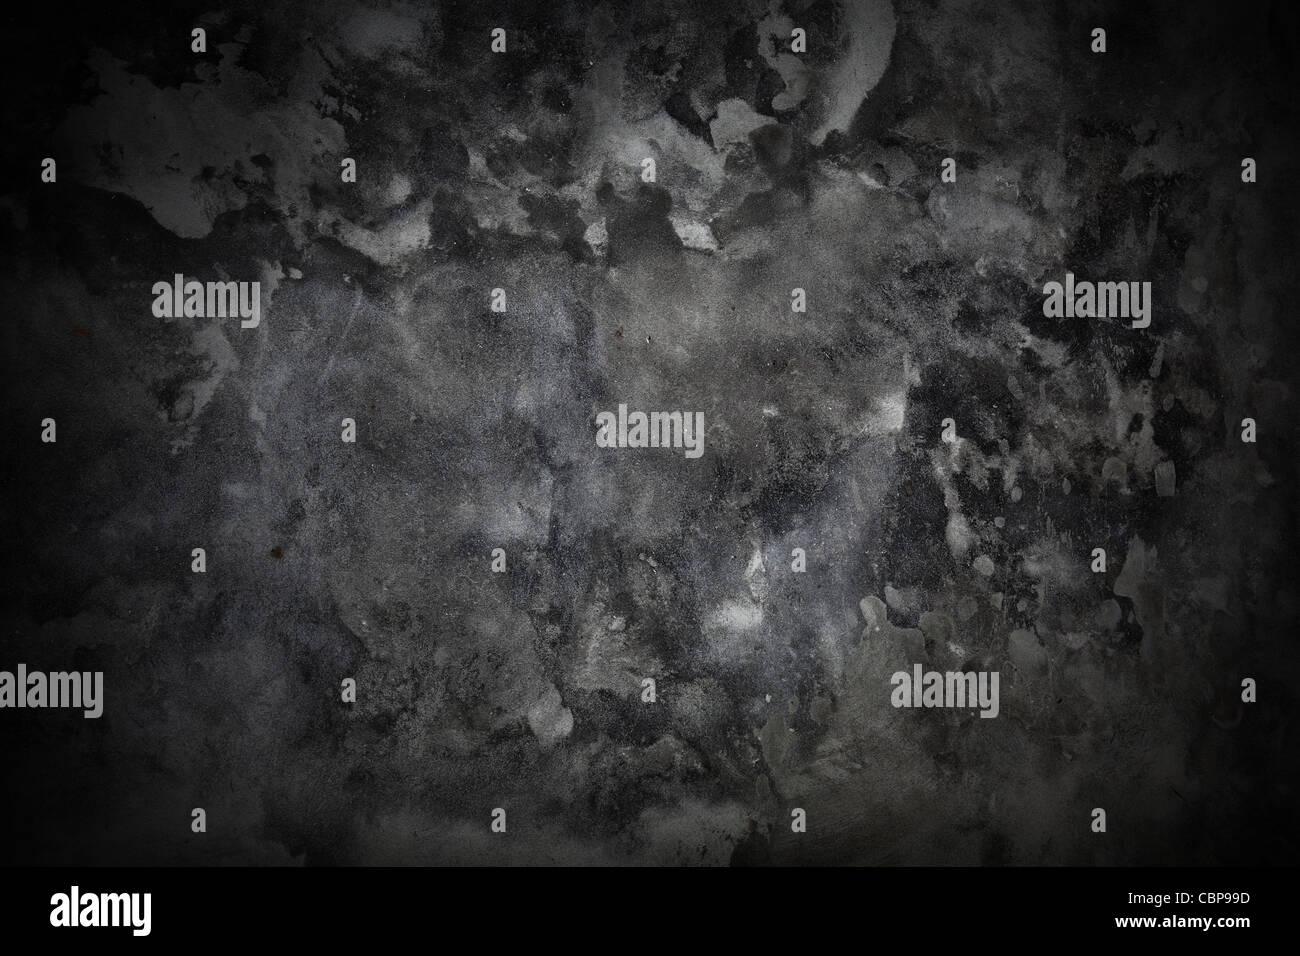 Cemento Gris oscuro grunge textura del fondo para su arte Imagen De Stock